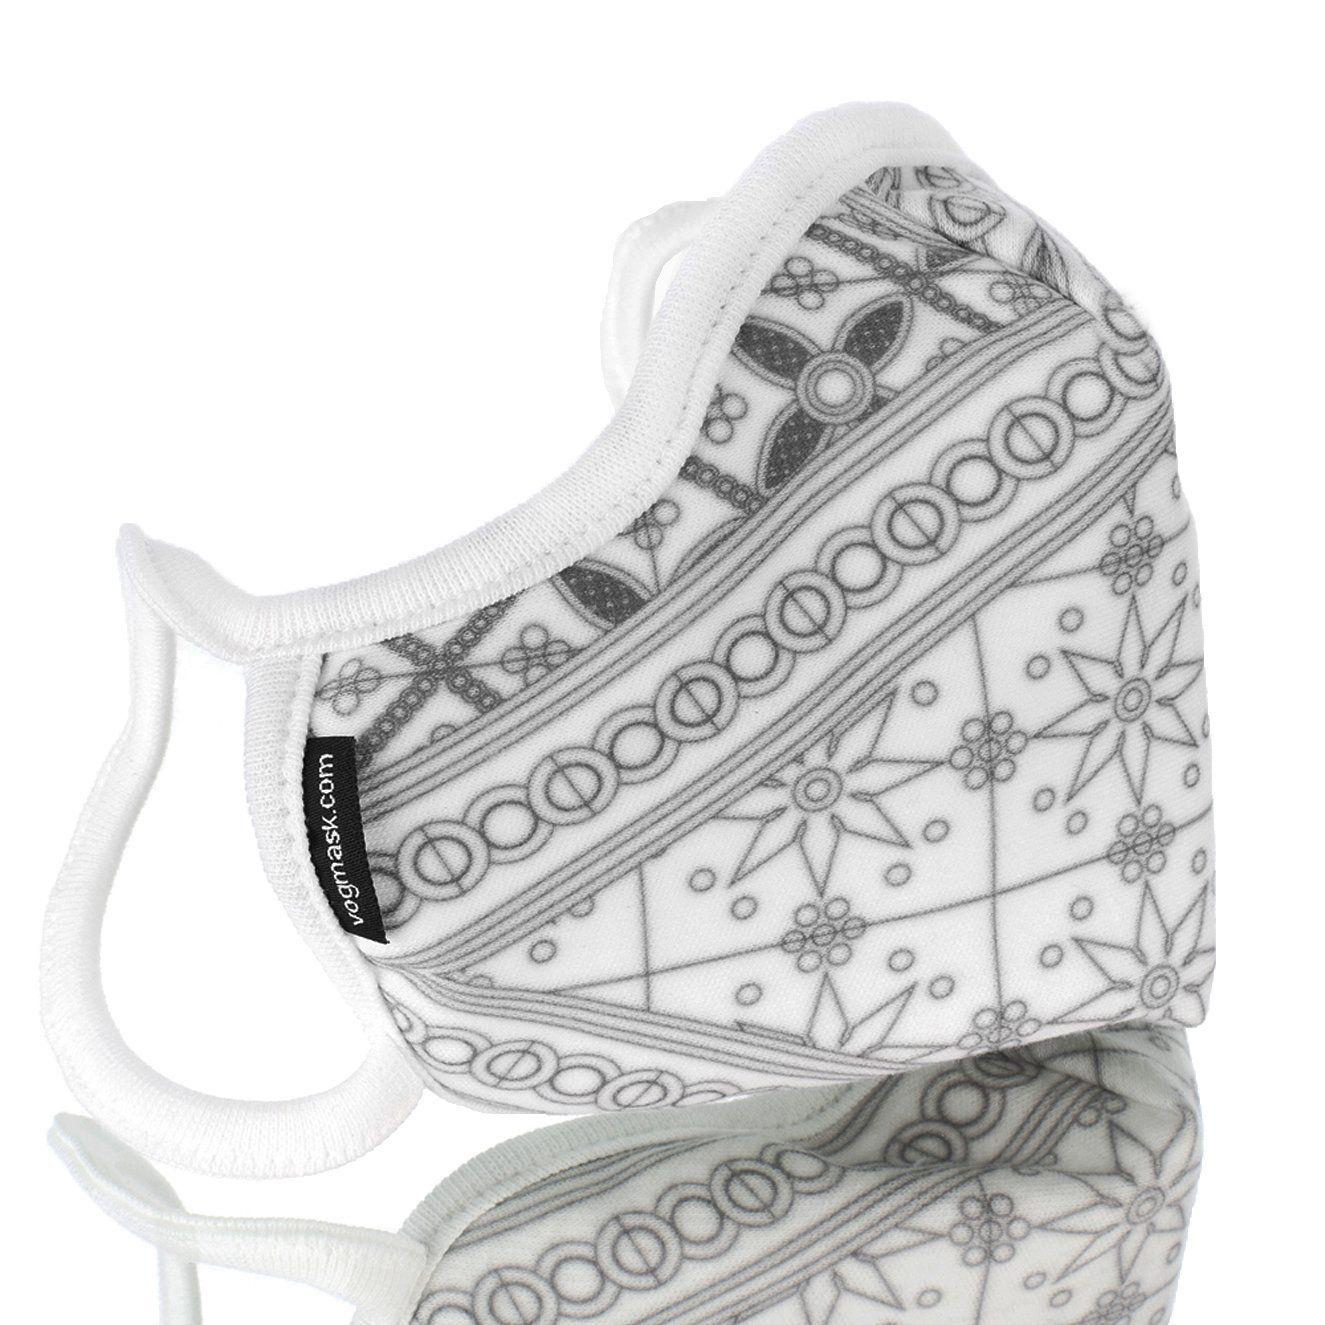 VOGMASK Organic Cotton Filtering Mask Batik